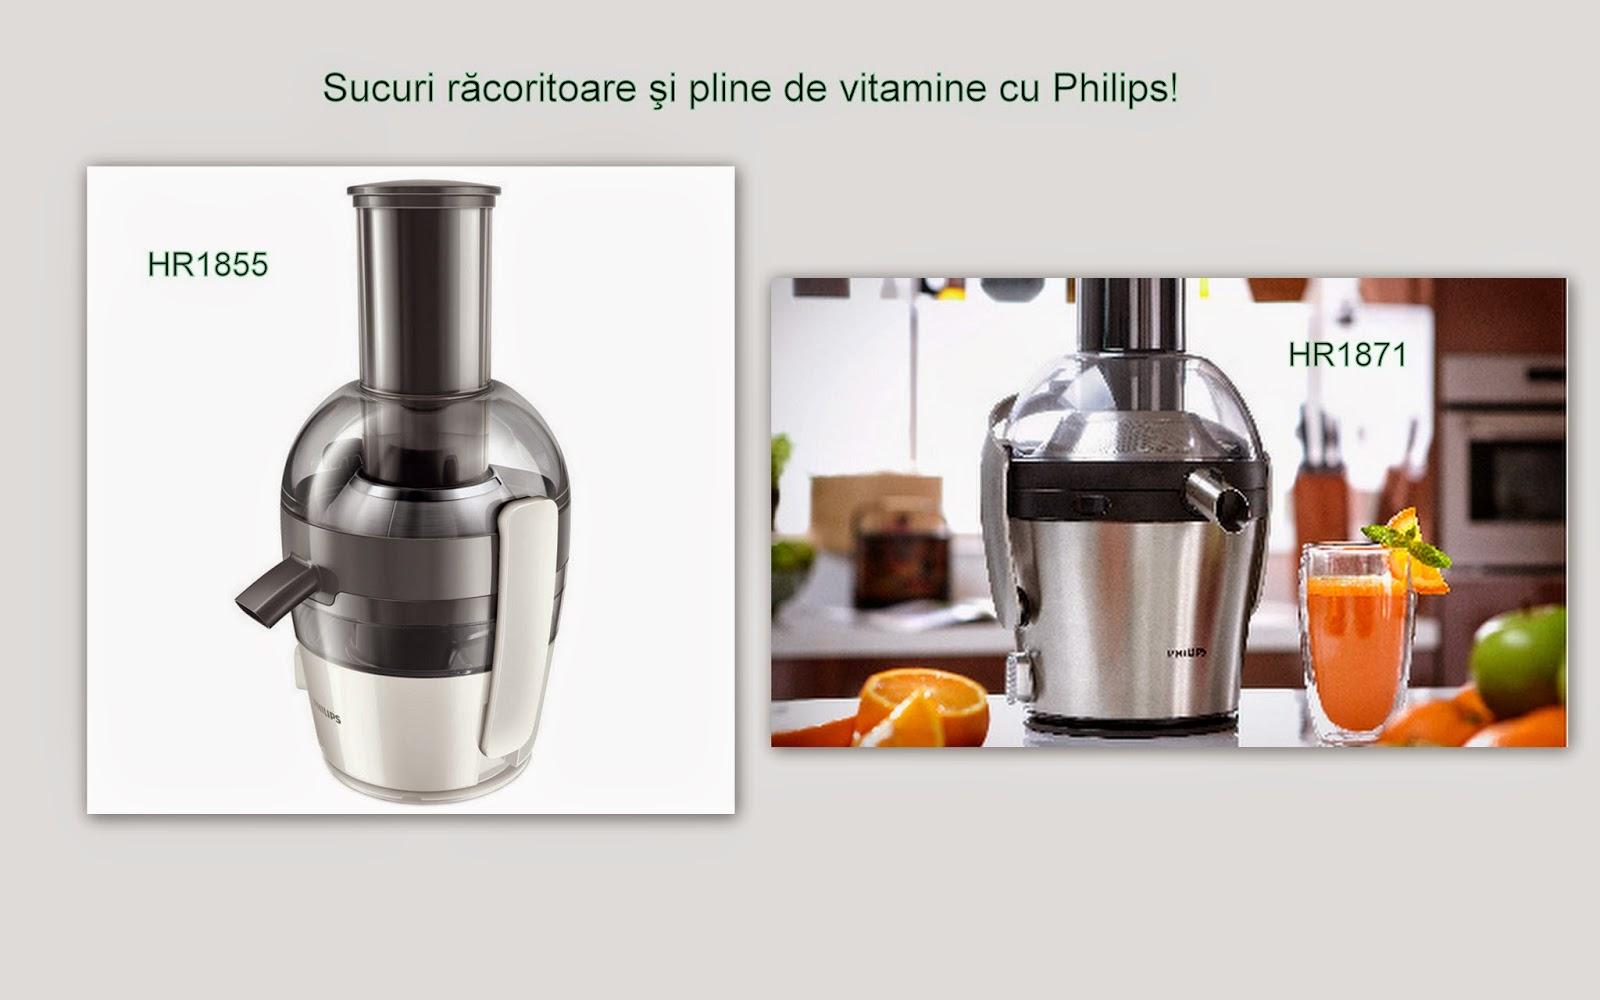 http://www.philips.ro/c/gatitul/viva-collection-multicooker-philips-hd3037_70/prd